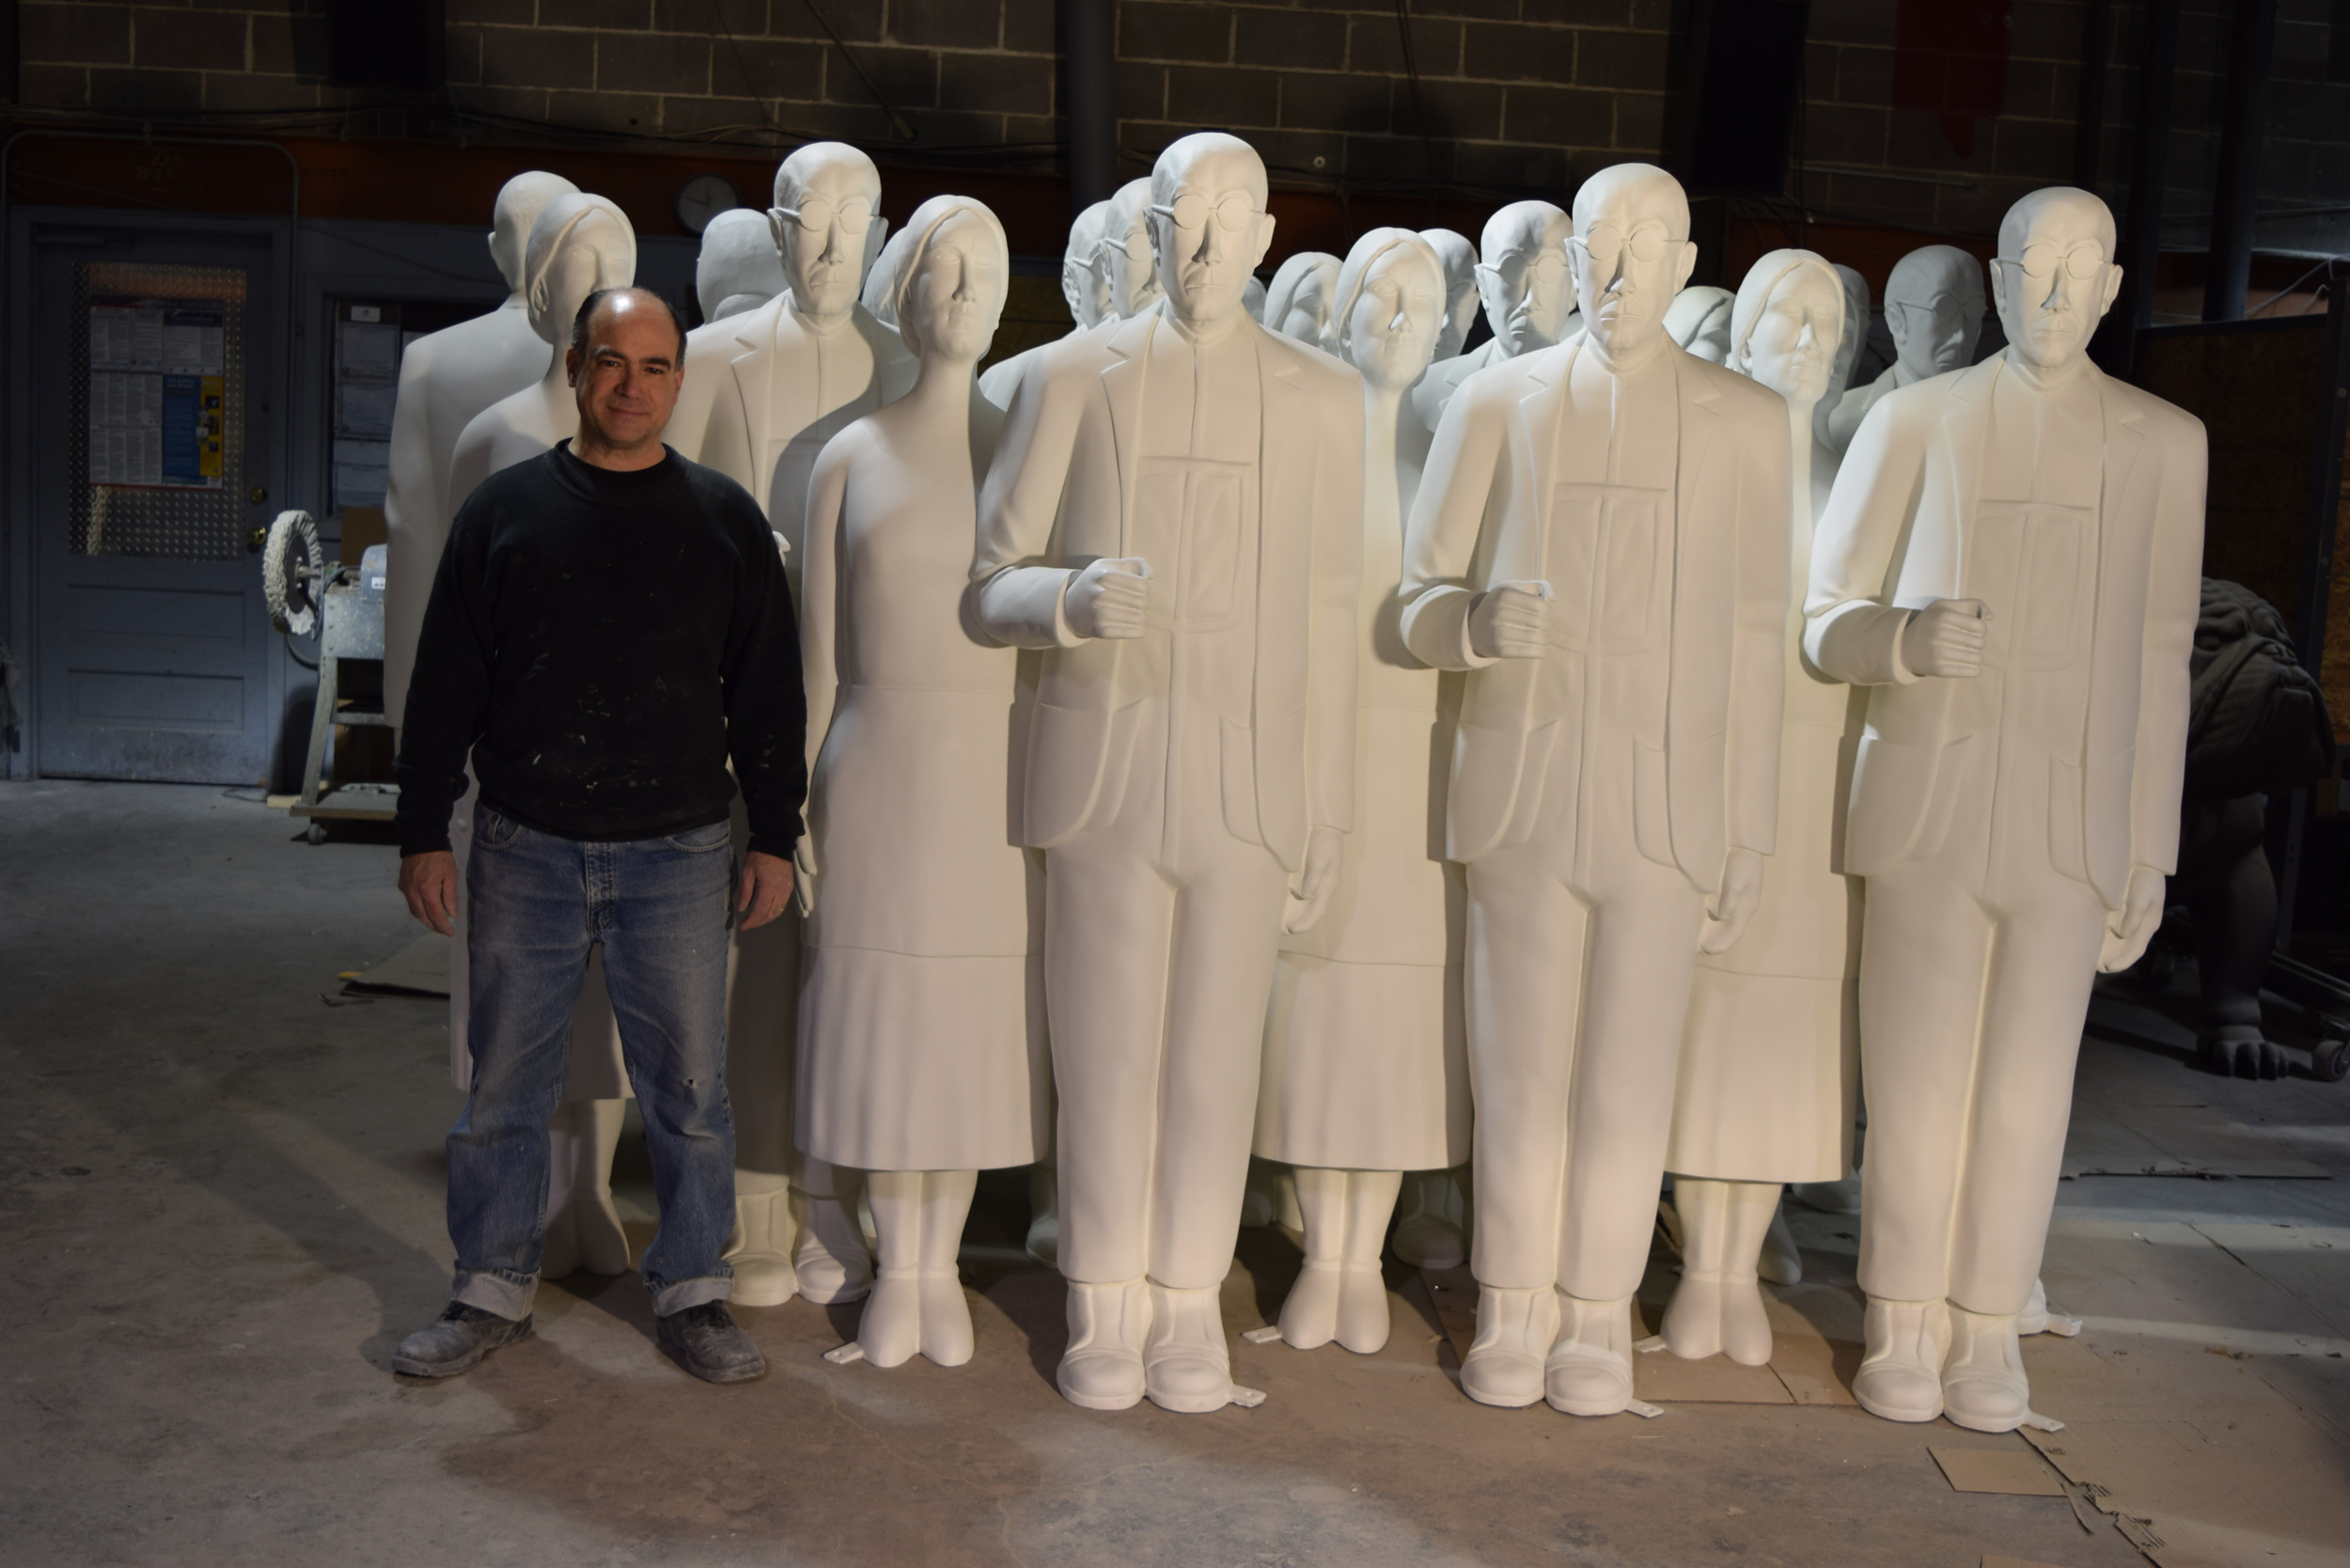 American Gothic Fiberglass sculptures